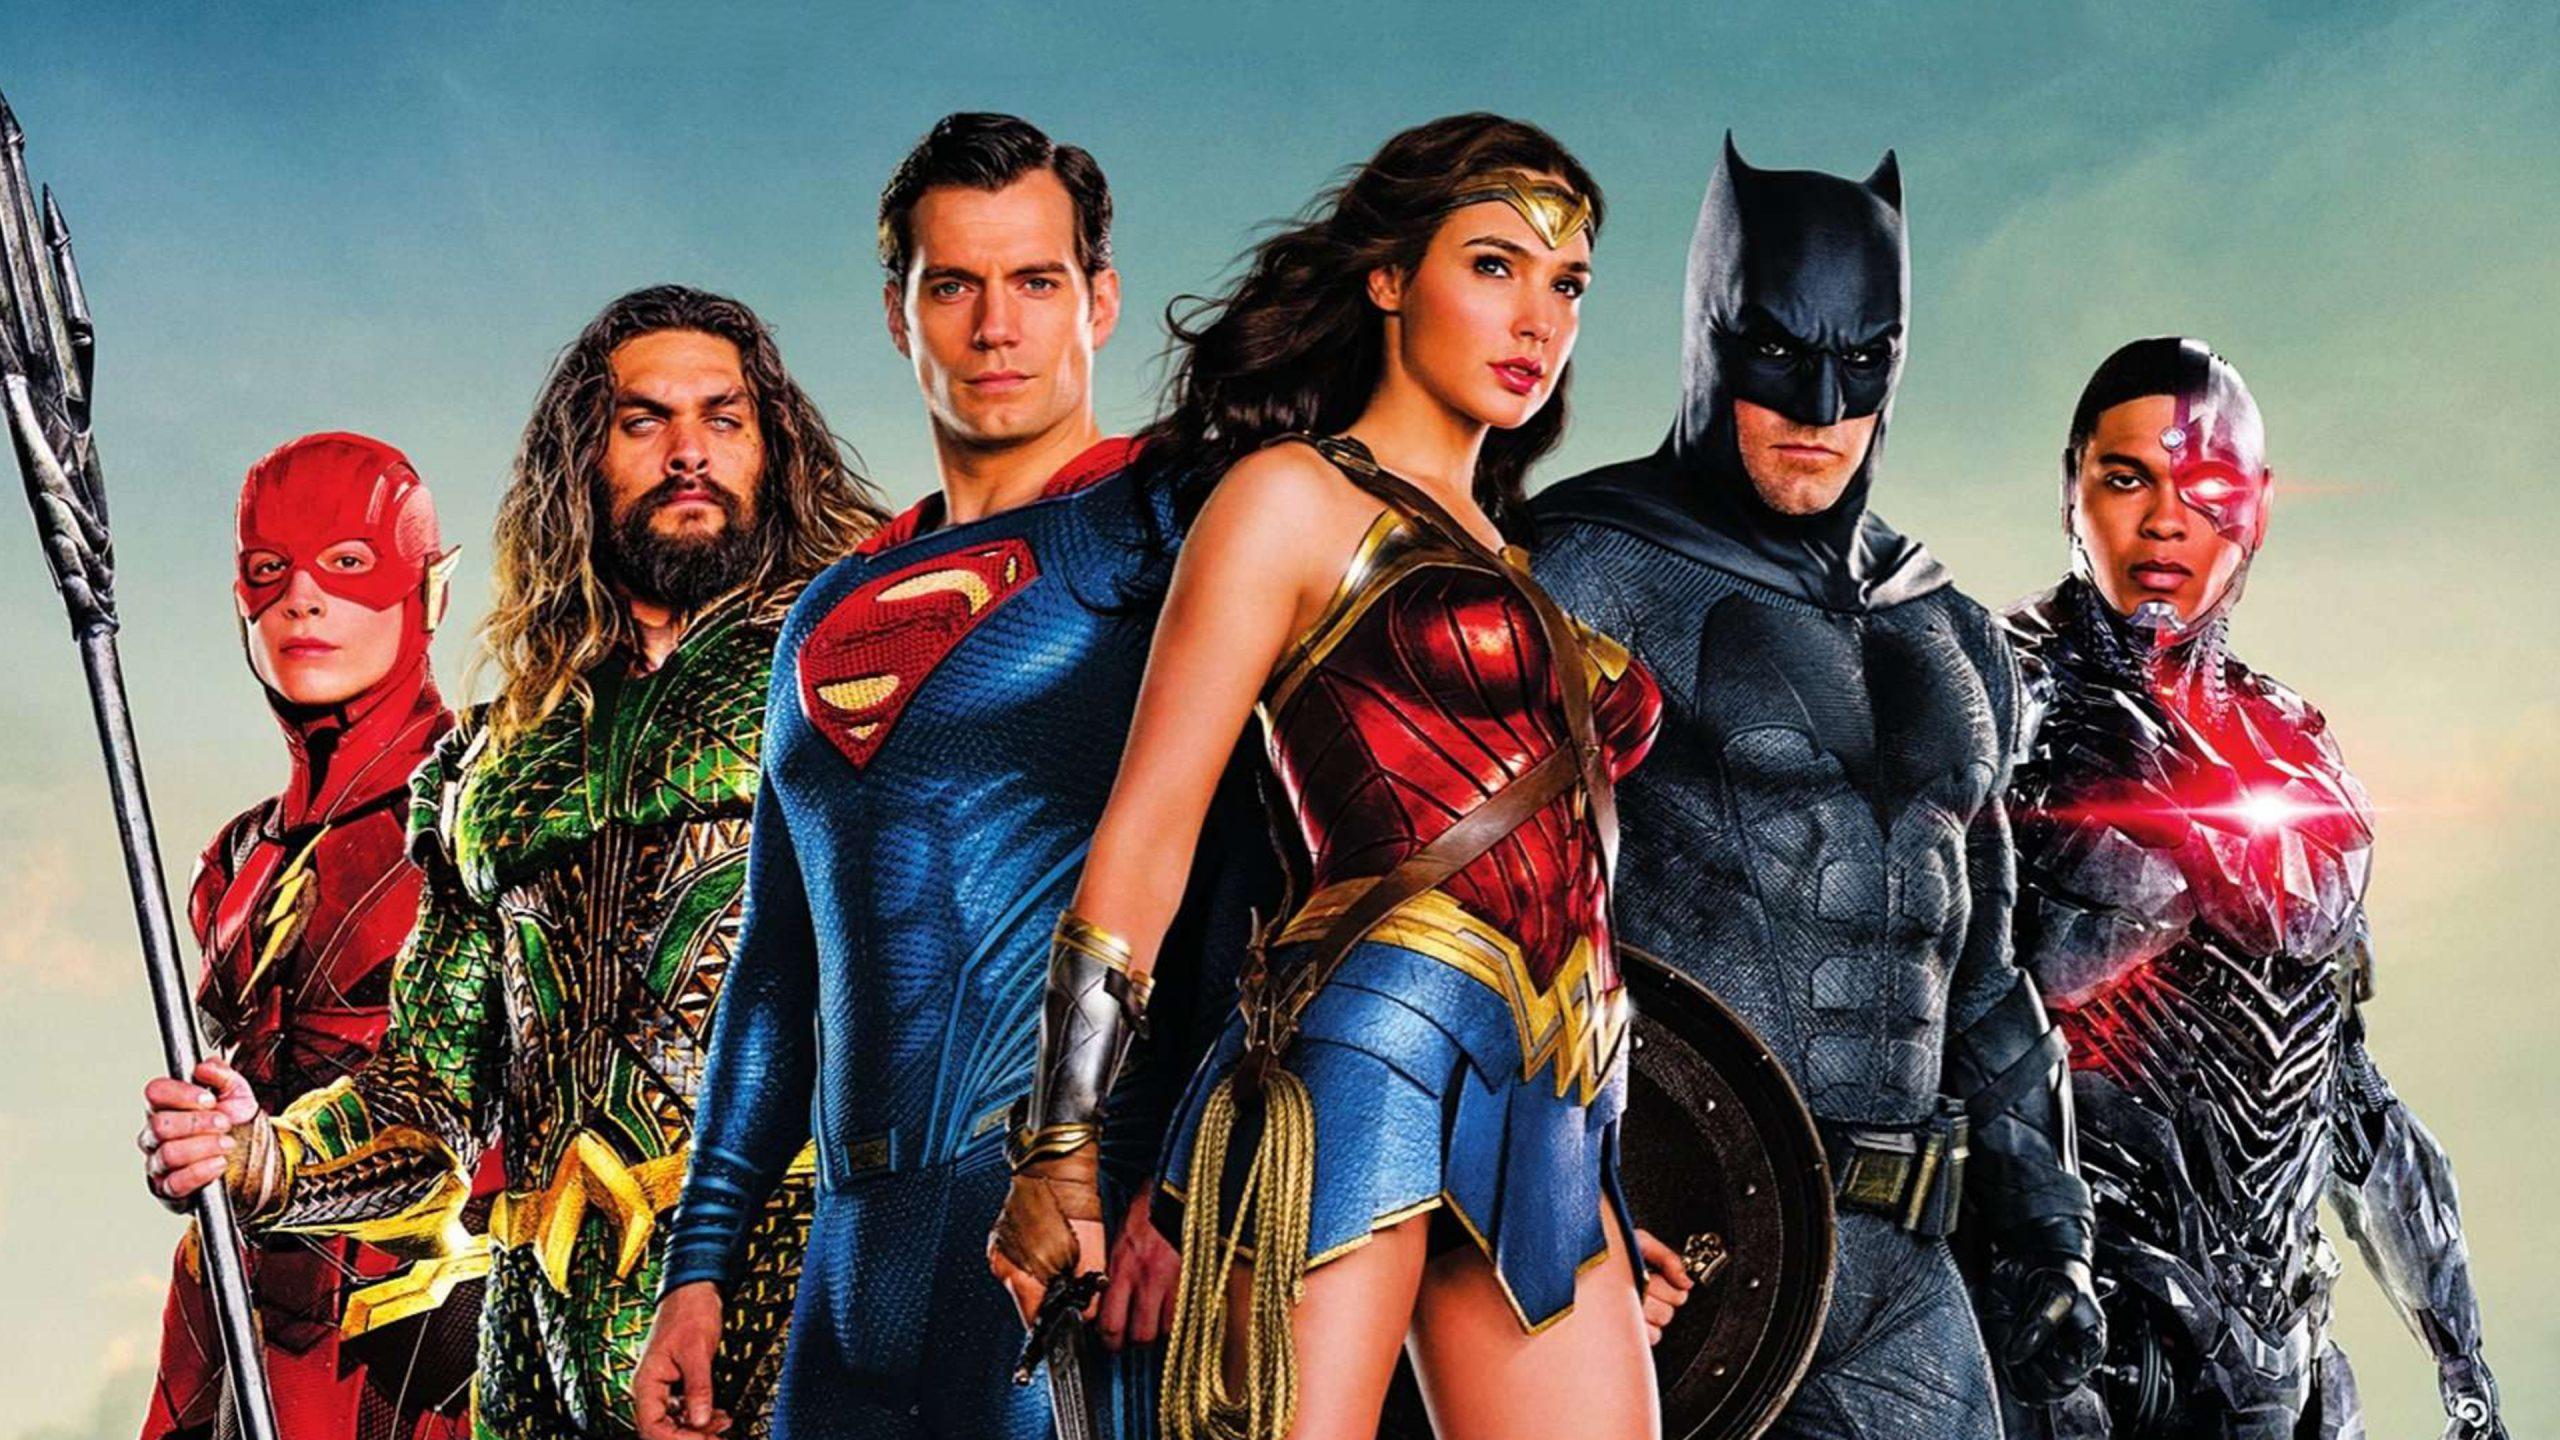 DC FanDome 2020: Zack Snyder's Justice League – folyamatosan frissül